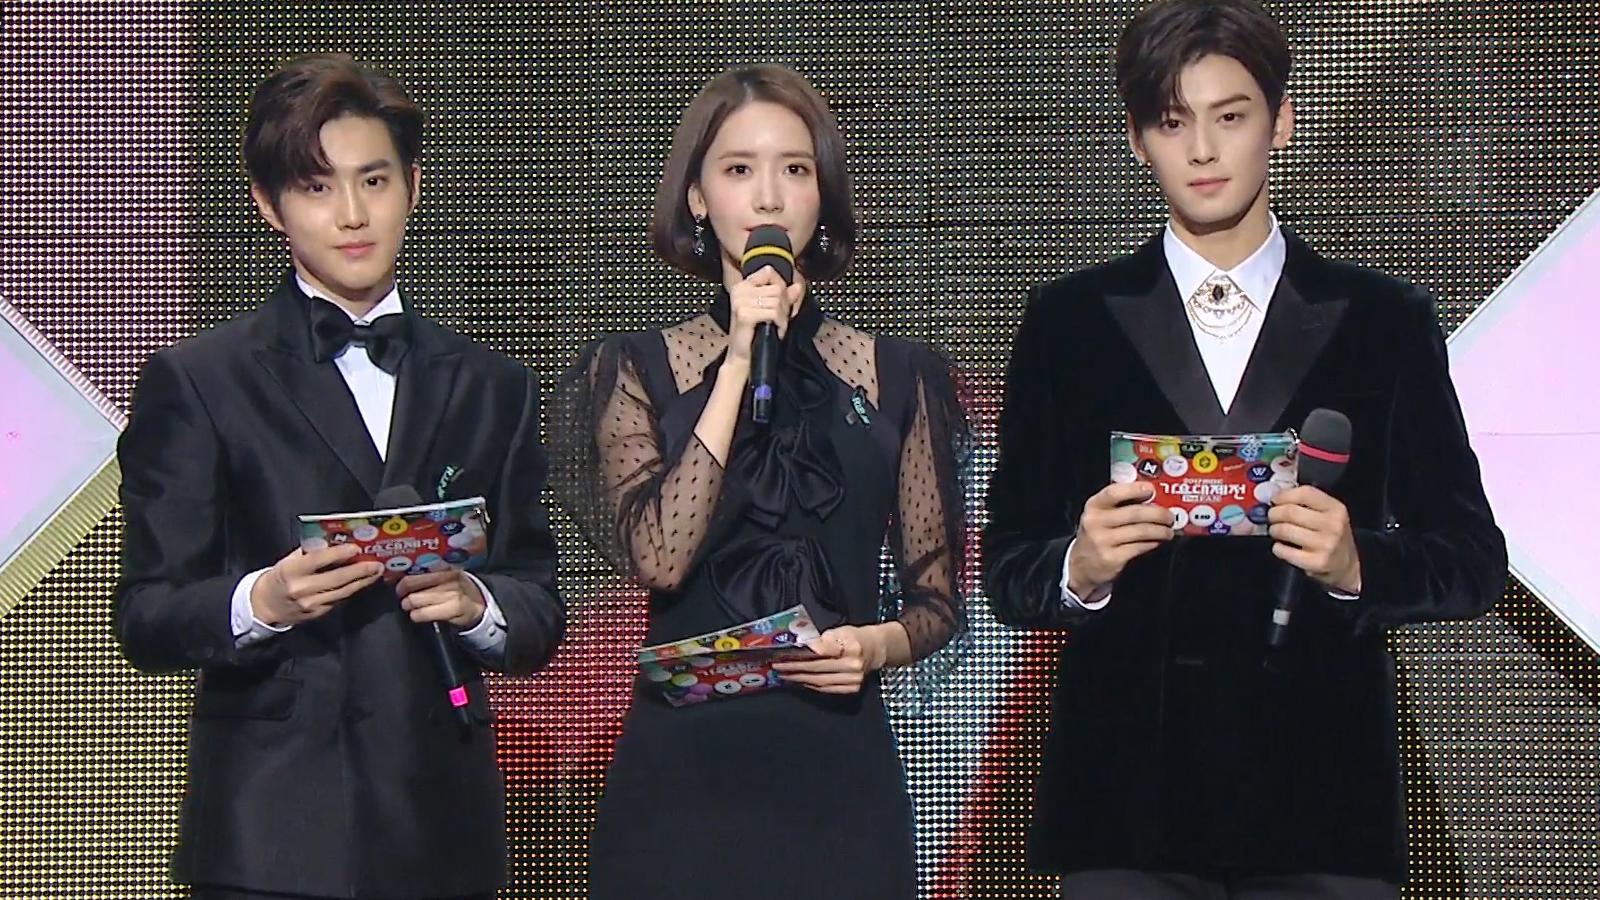 Festival de música MBC 2017 Episodio 1